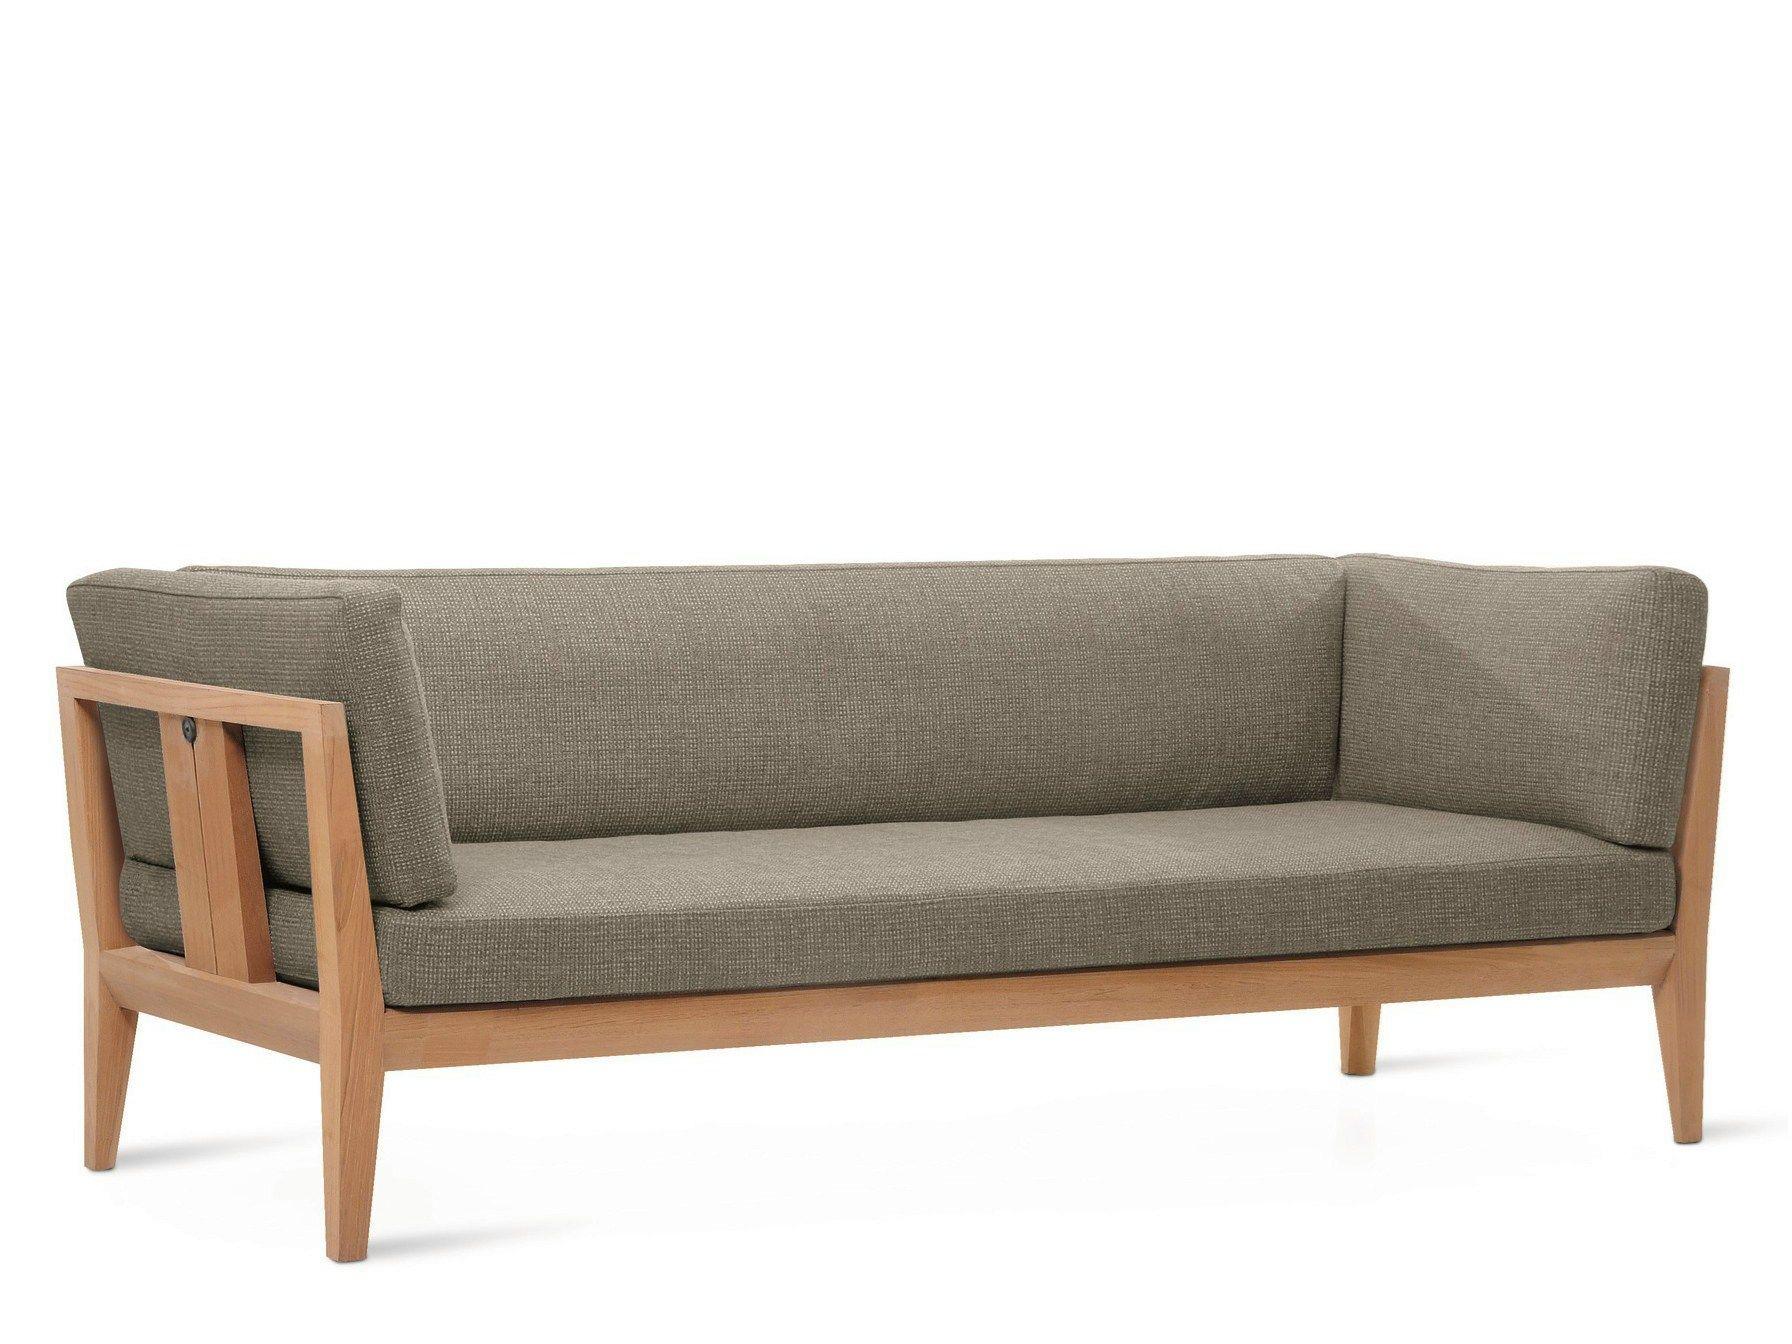 Teka 3 Seater Sofa By Roda Sillones Sillas Y Bancos  # Muebles Teka Barcelona